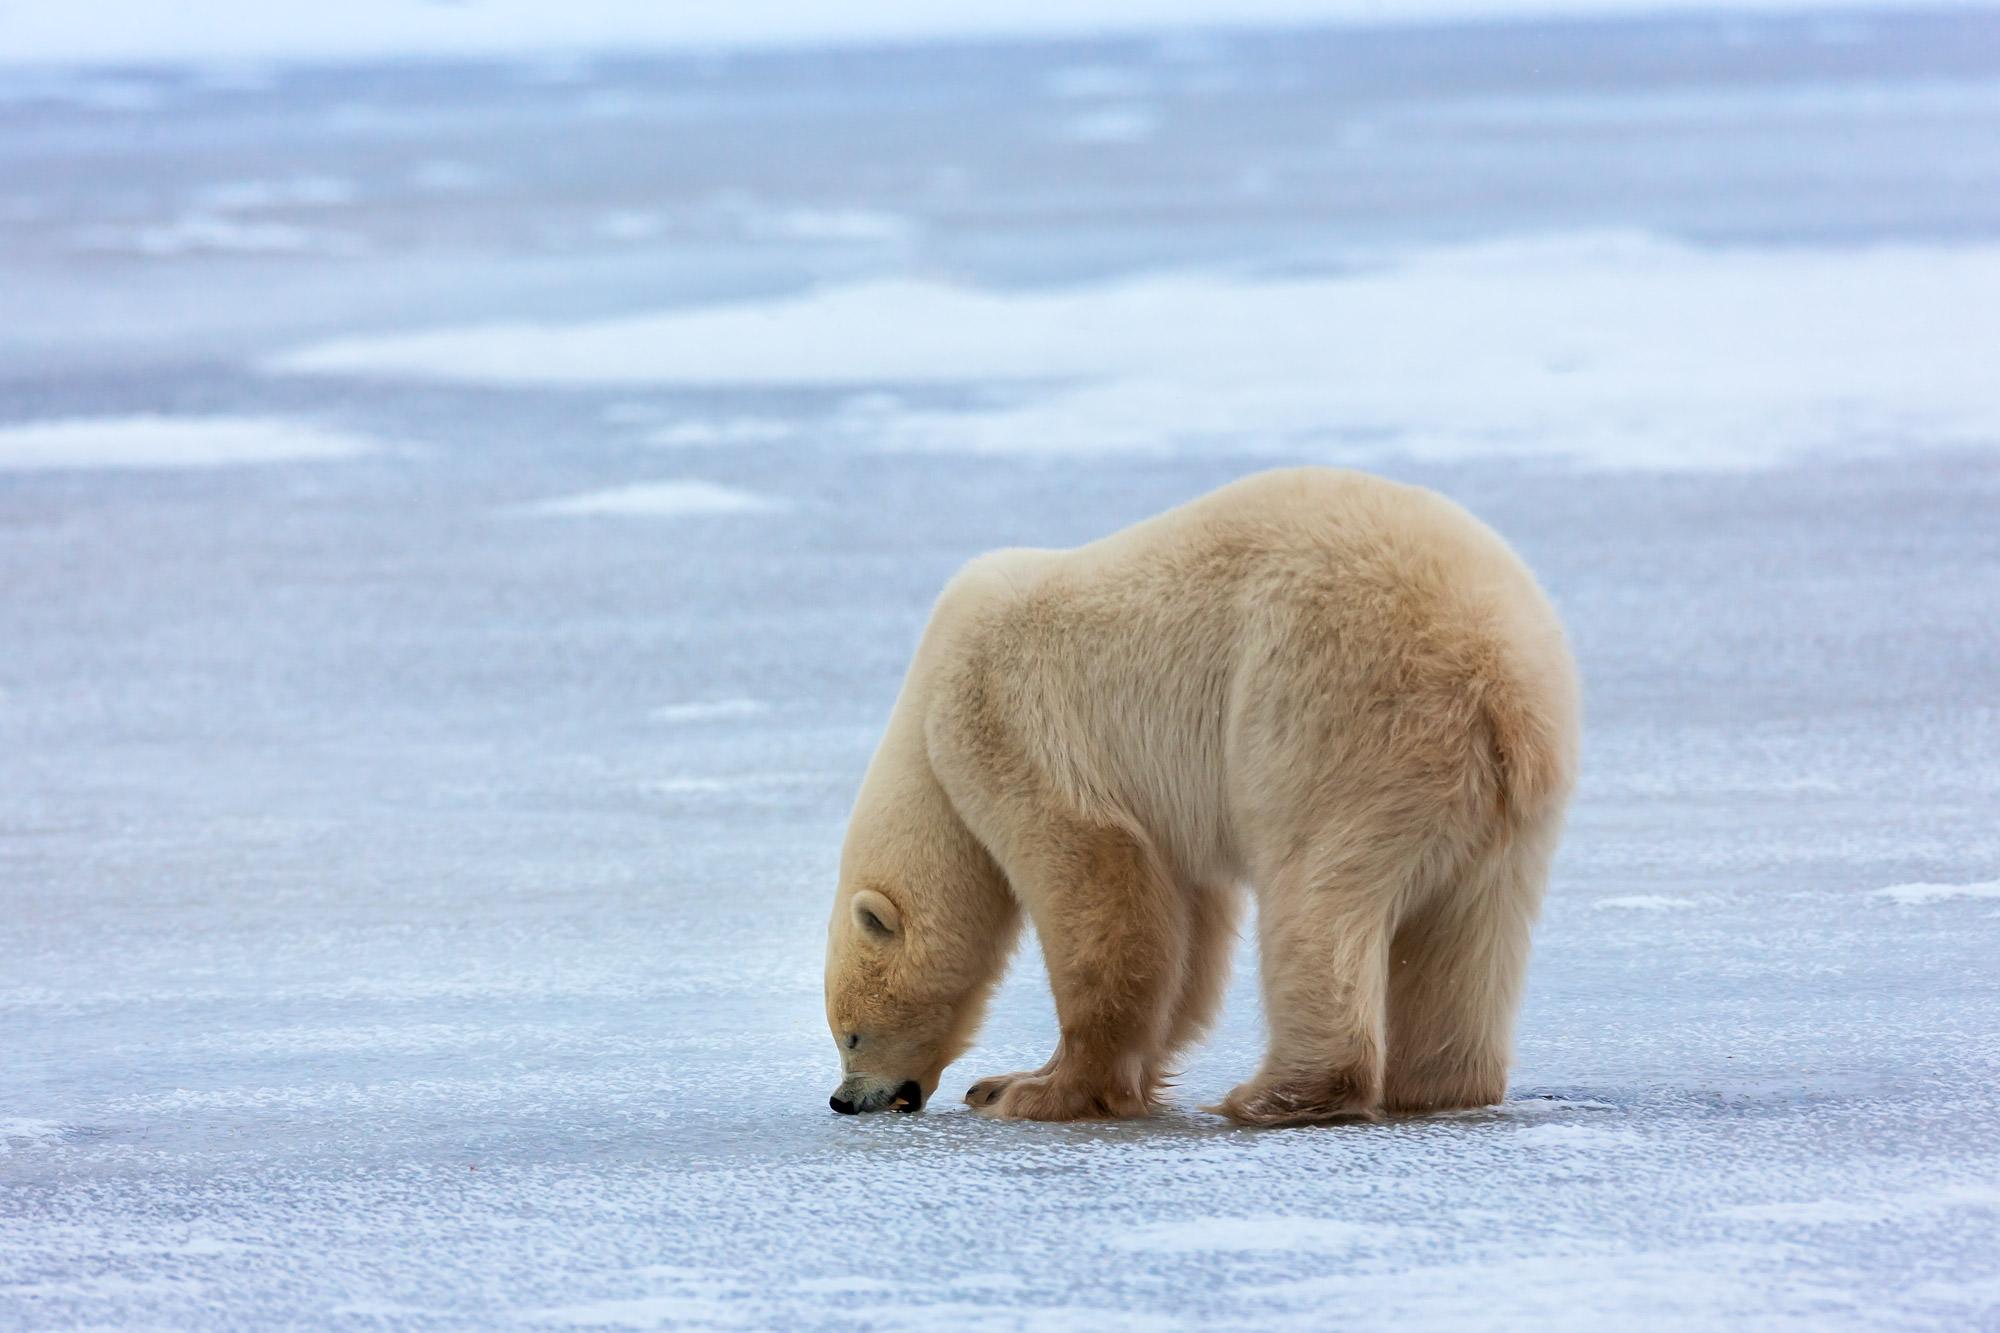 Bear, Polar Bear, Churchill, Manitoba, limited edition, photograph. fine art, wildlife, photo